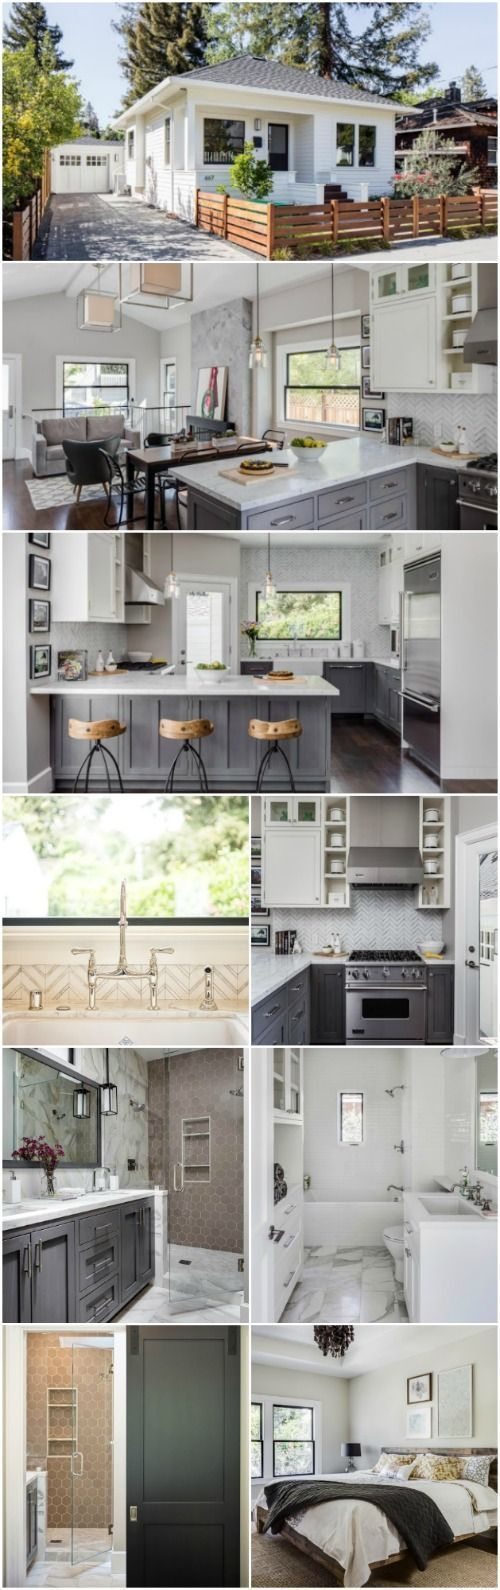 Home interior names californian interior designer designs dreamy tiny house in napa